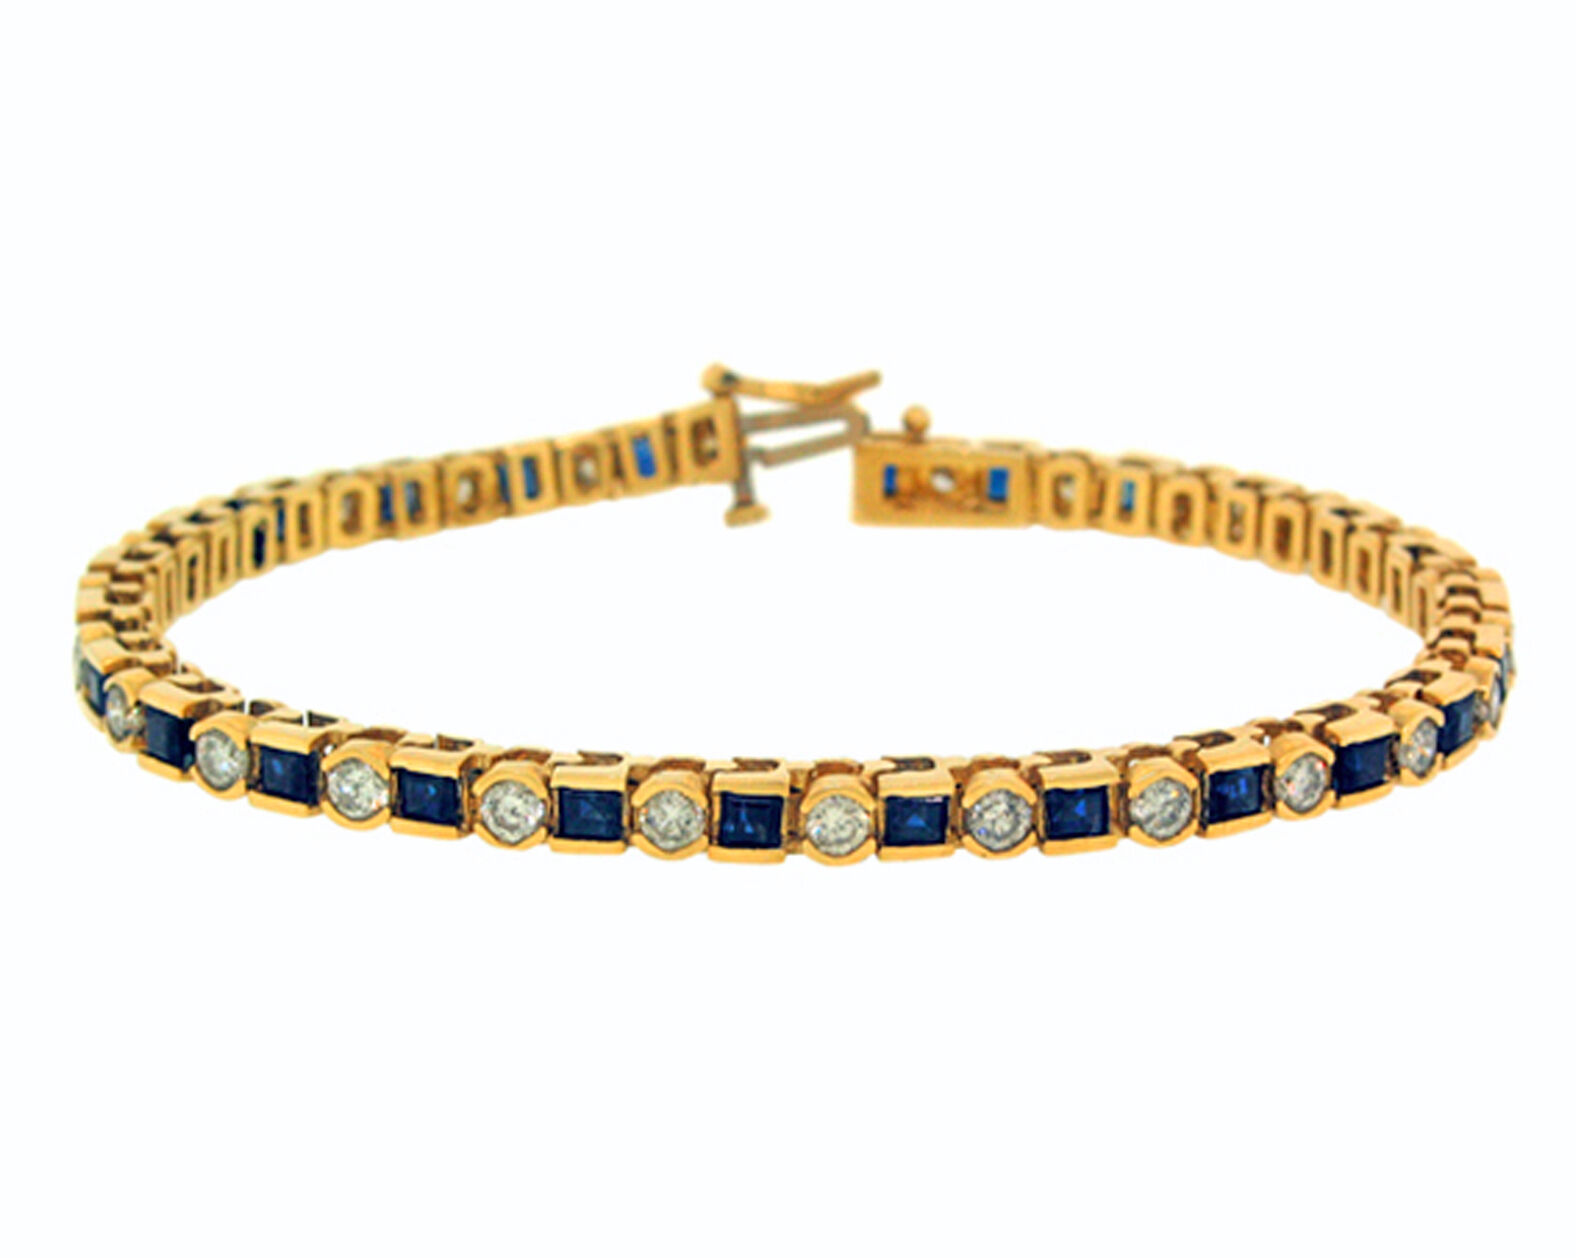 2.2 Carat Round Cut Diamond Engagement Ring Vs1/g White Gold 14k 6257 Fine Jewelry Fine Rings